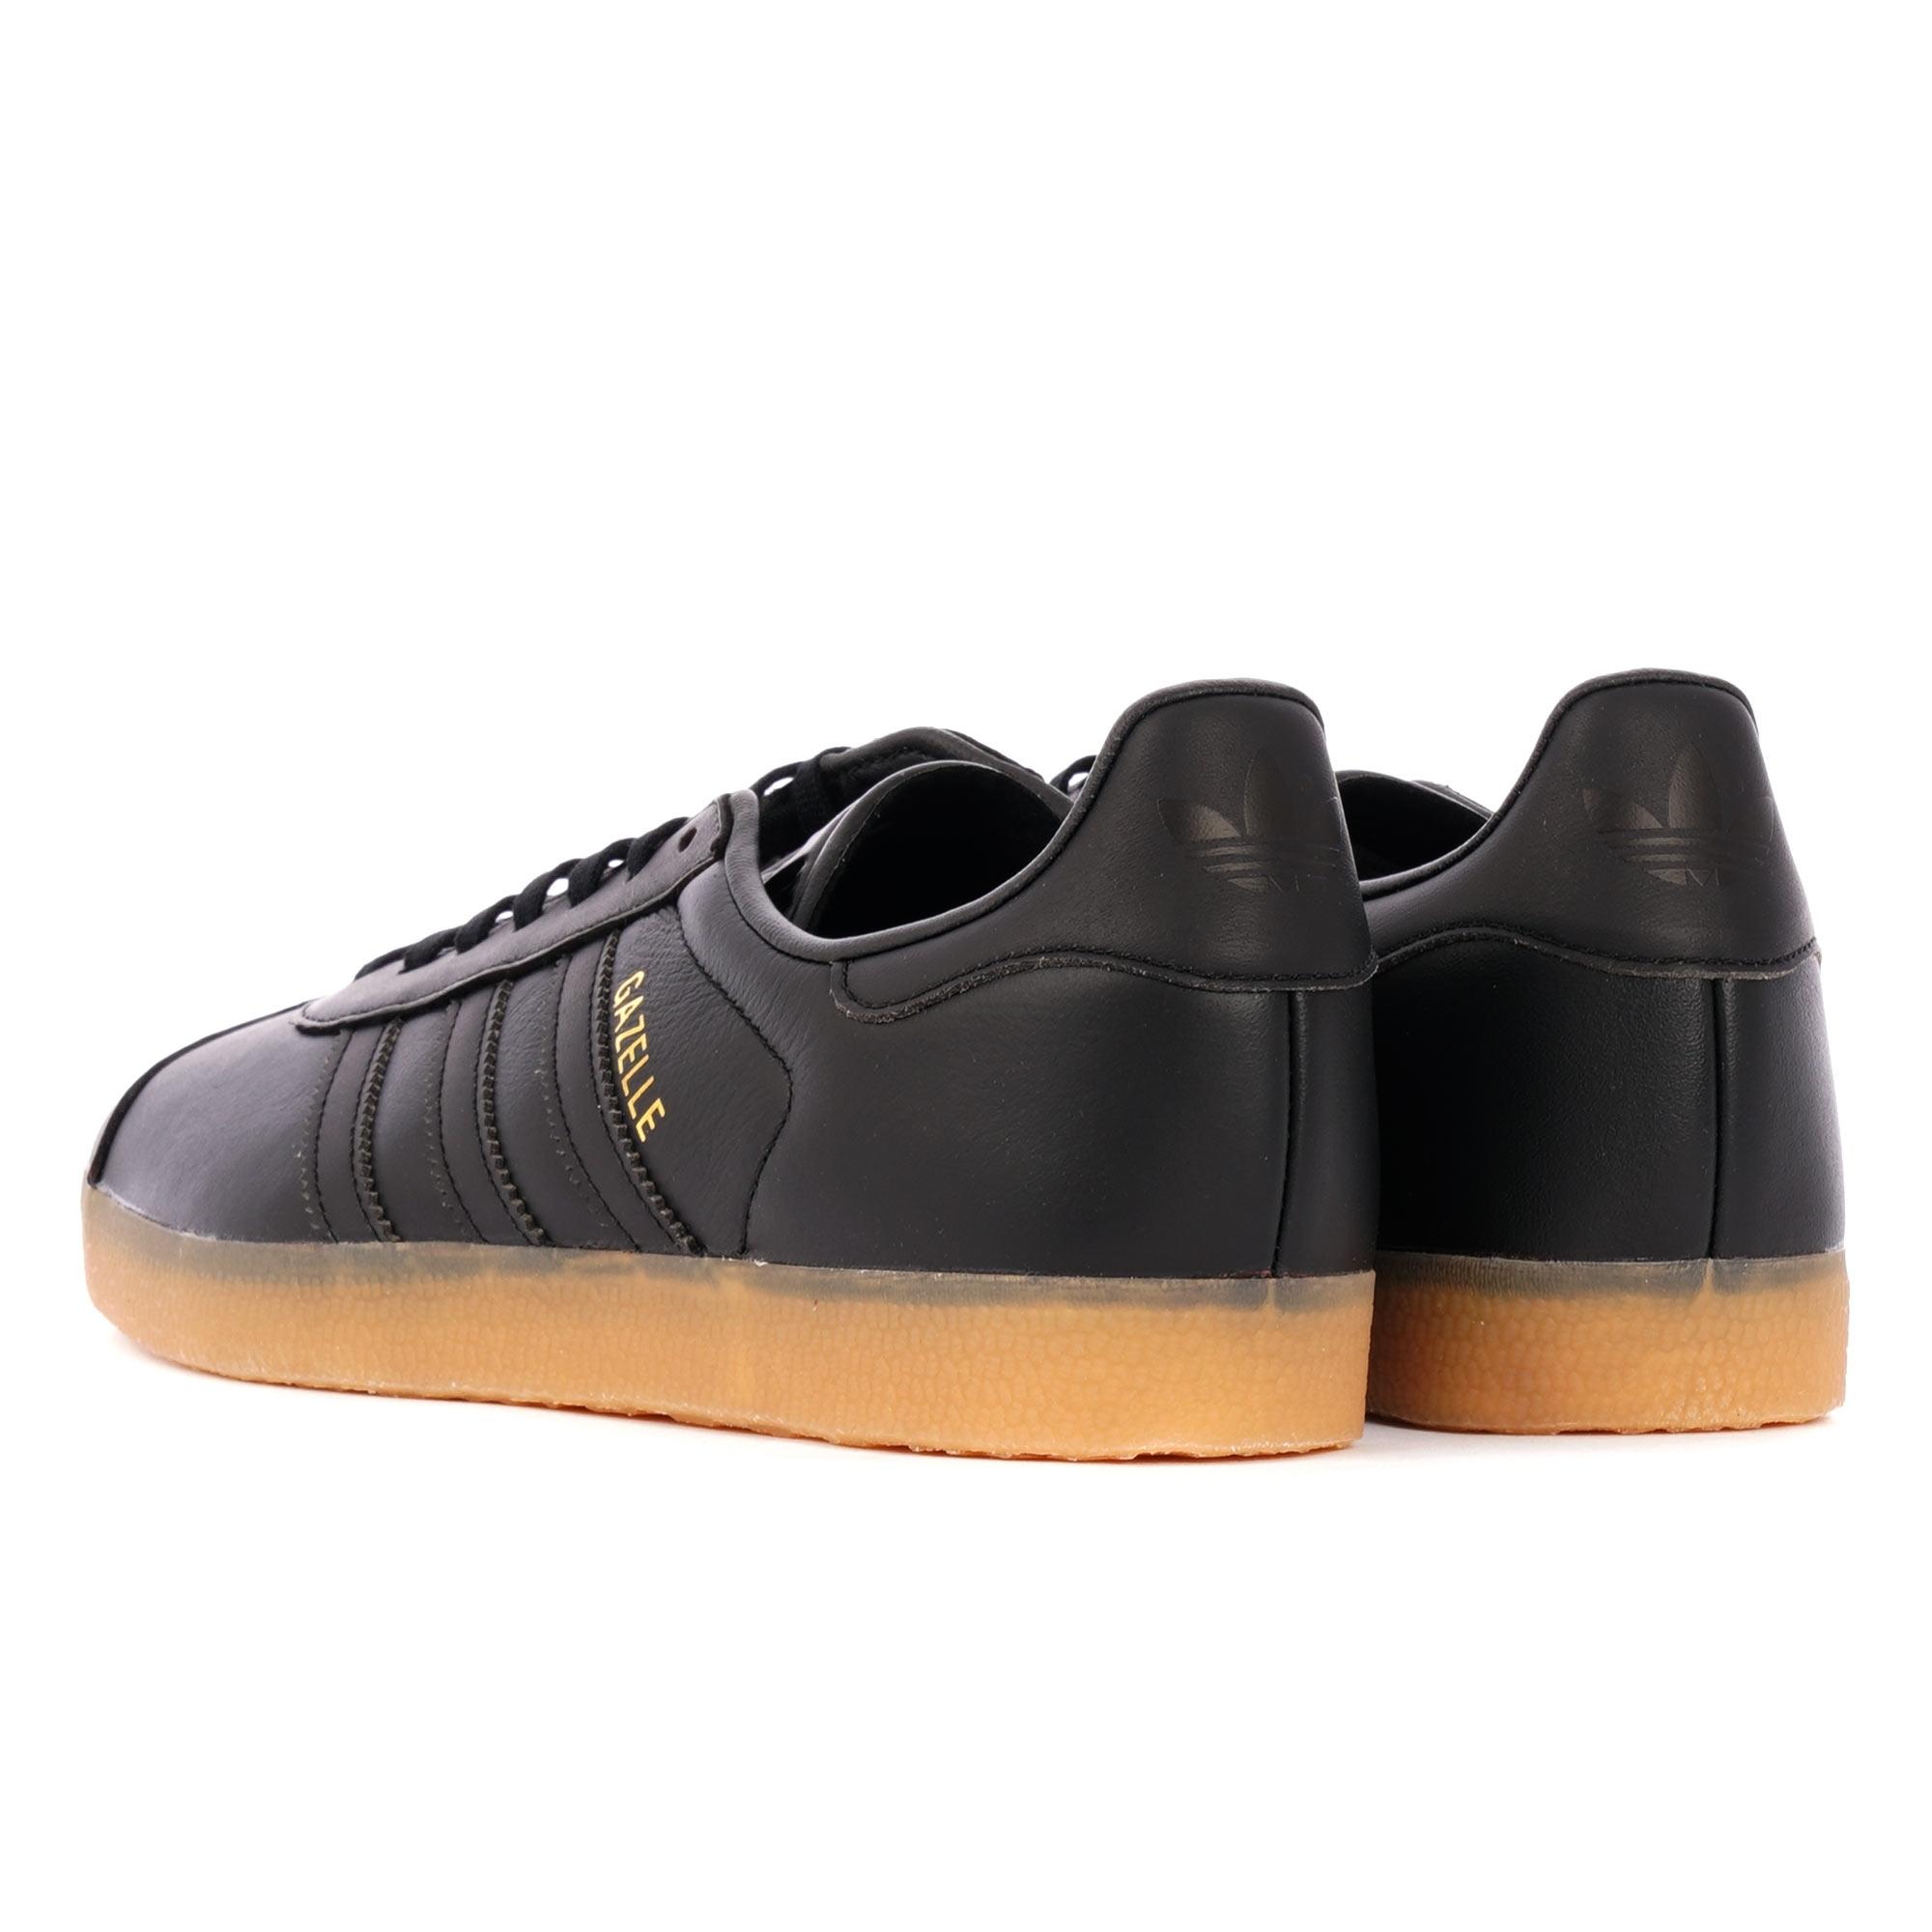 adidas Originals Gazelle | Core Black